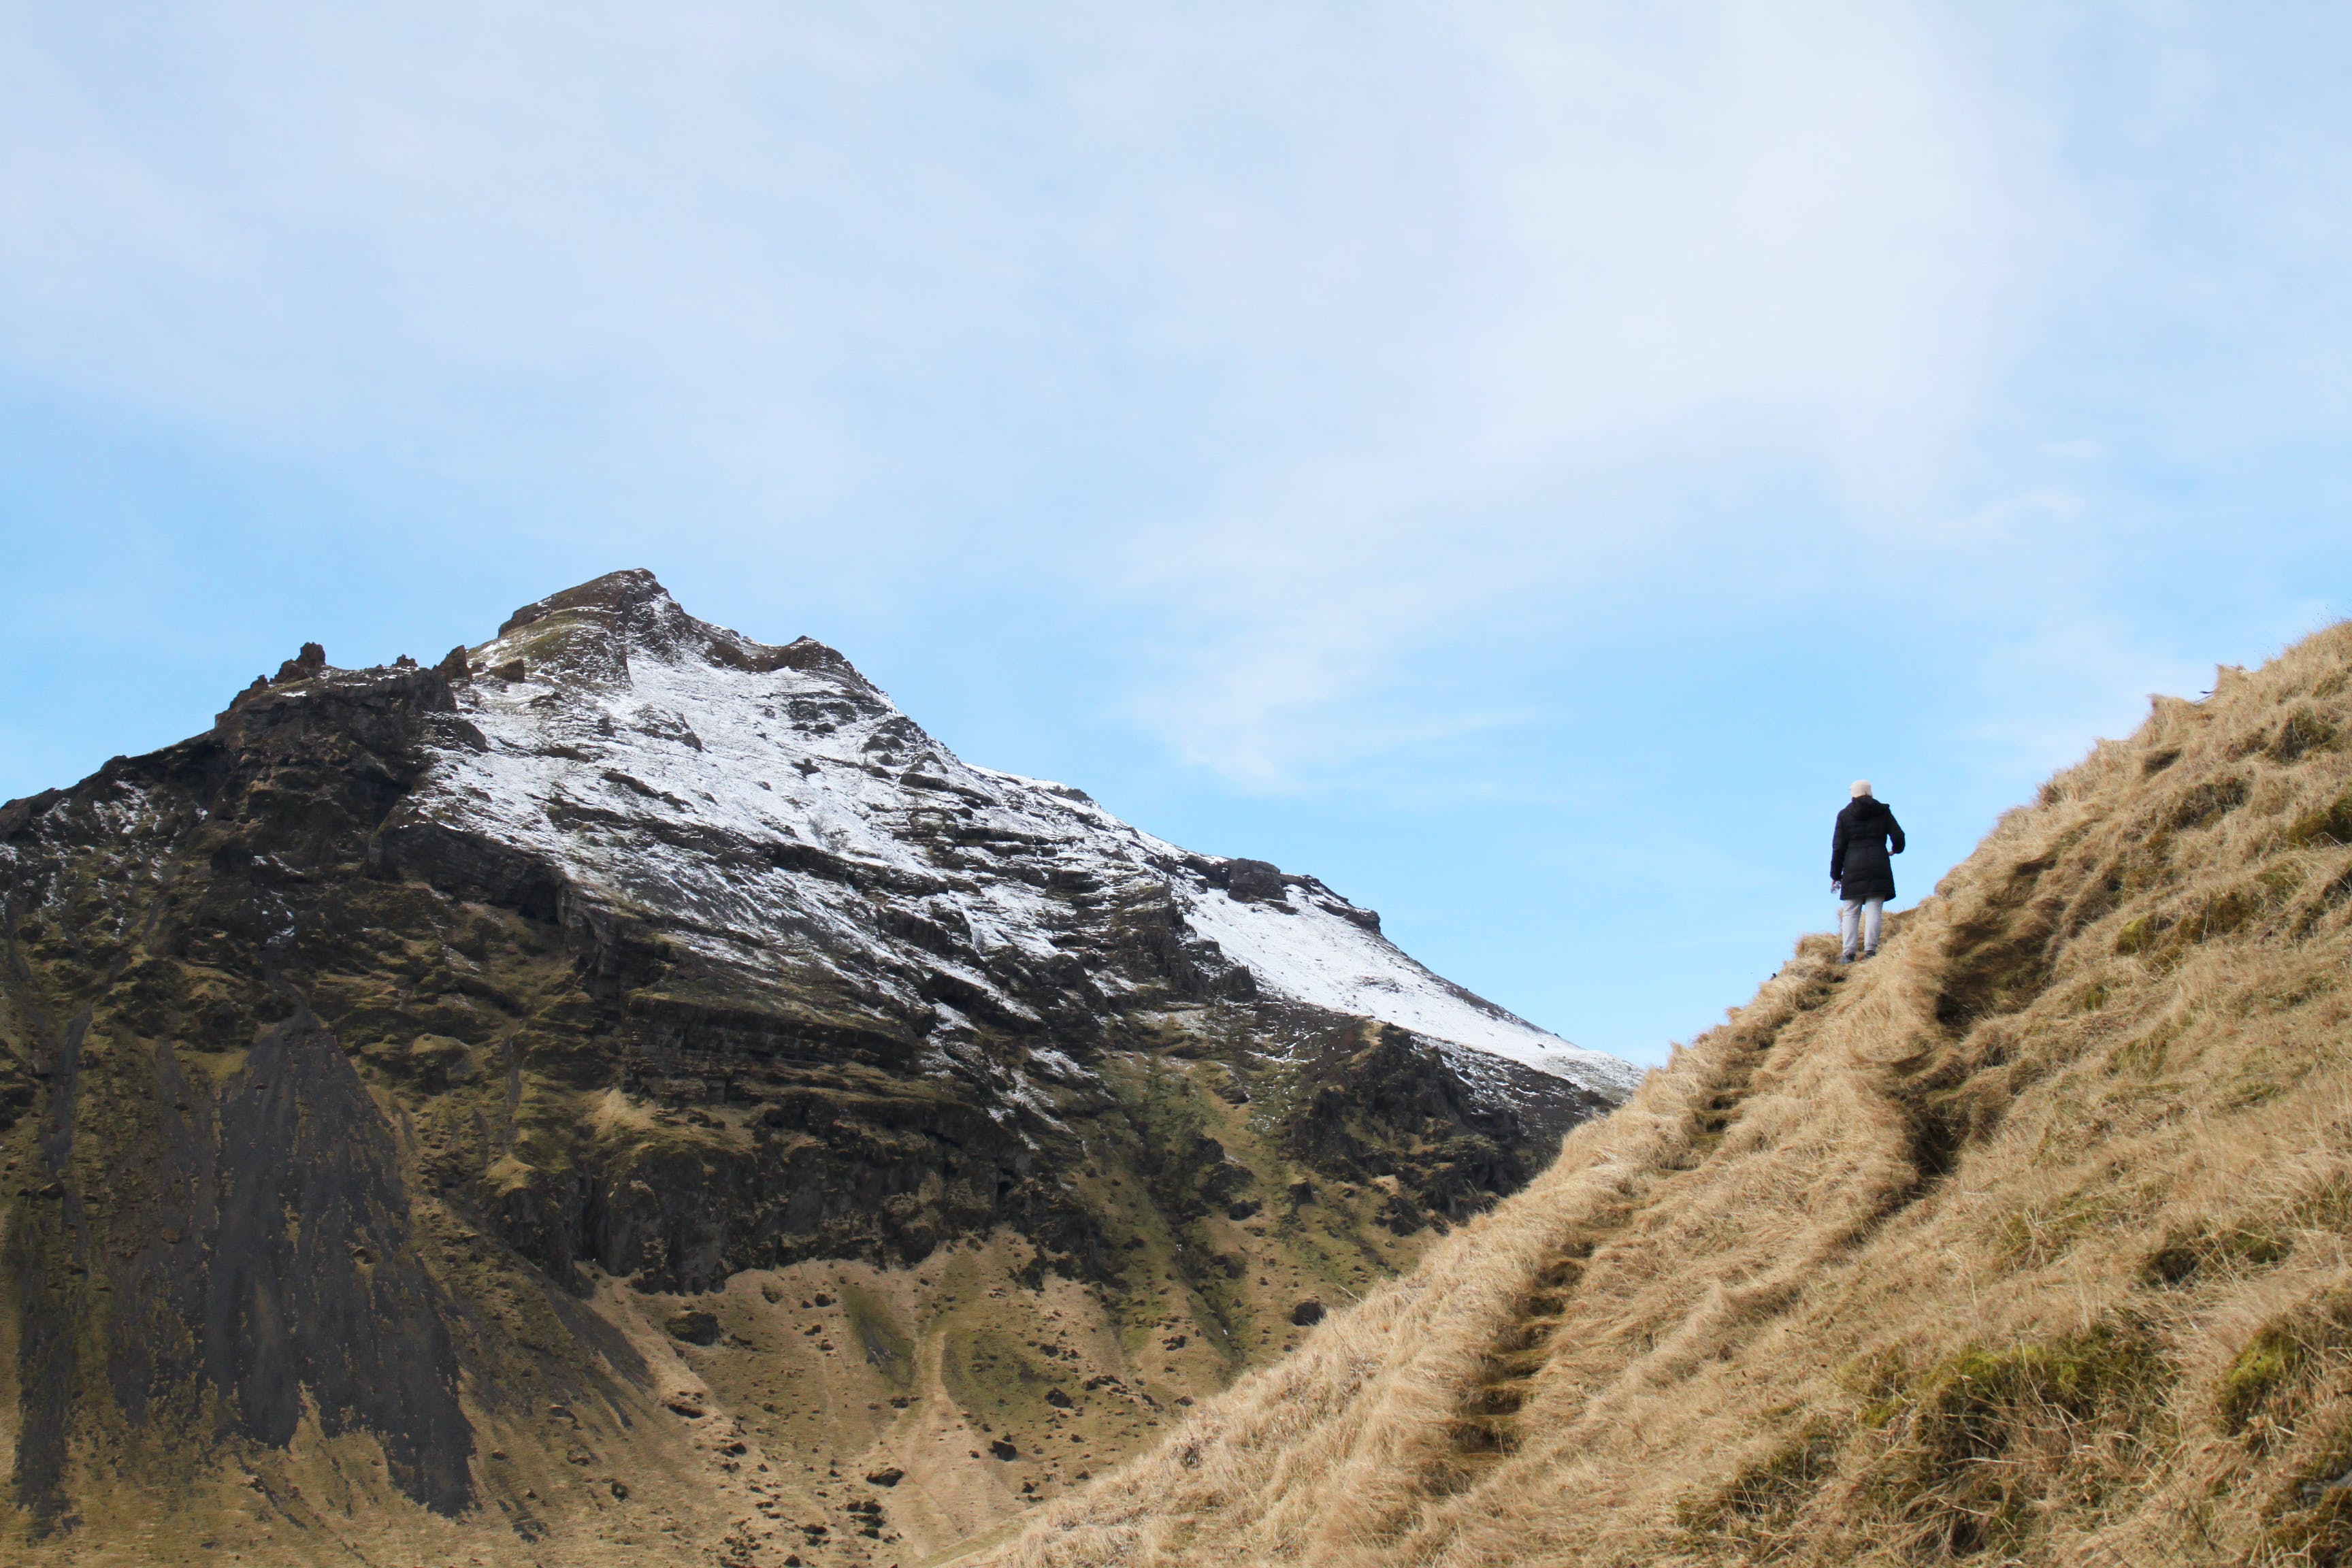 Kostenloses Stock Foto zu abenteuer, berg, bergsteiger, bergwandern